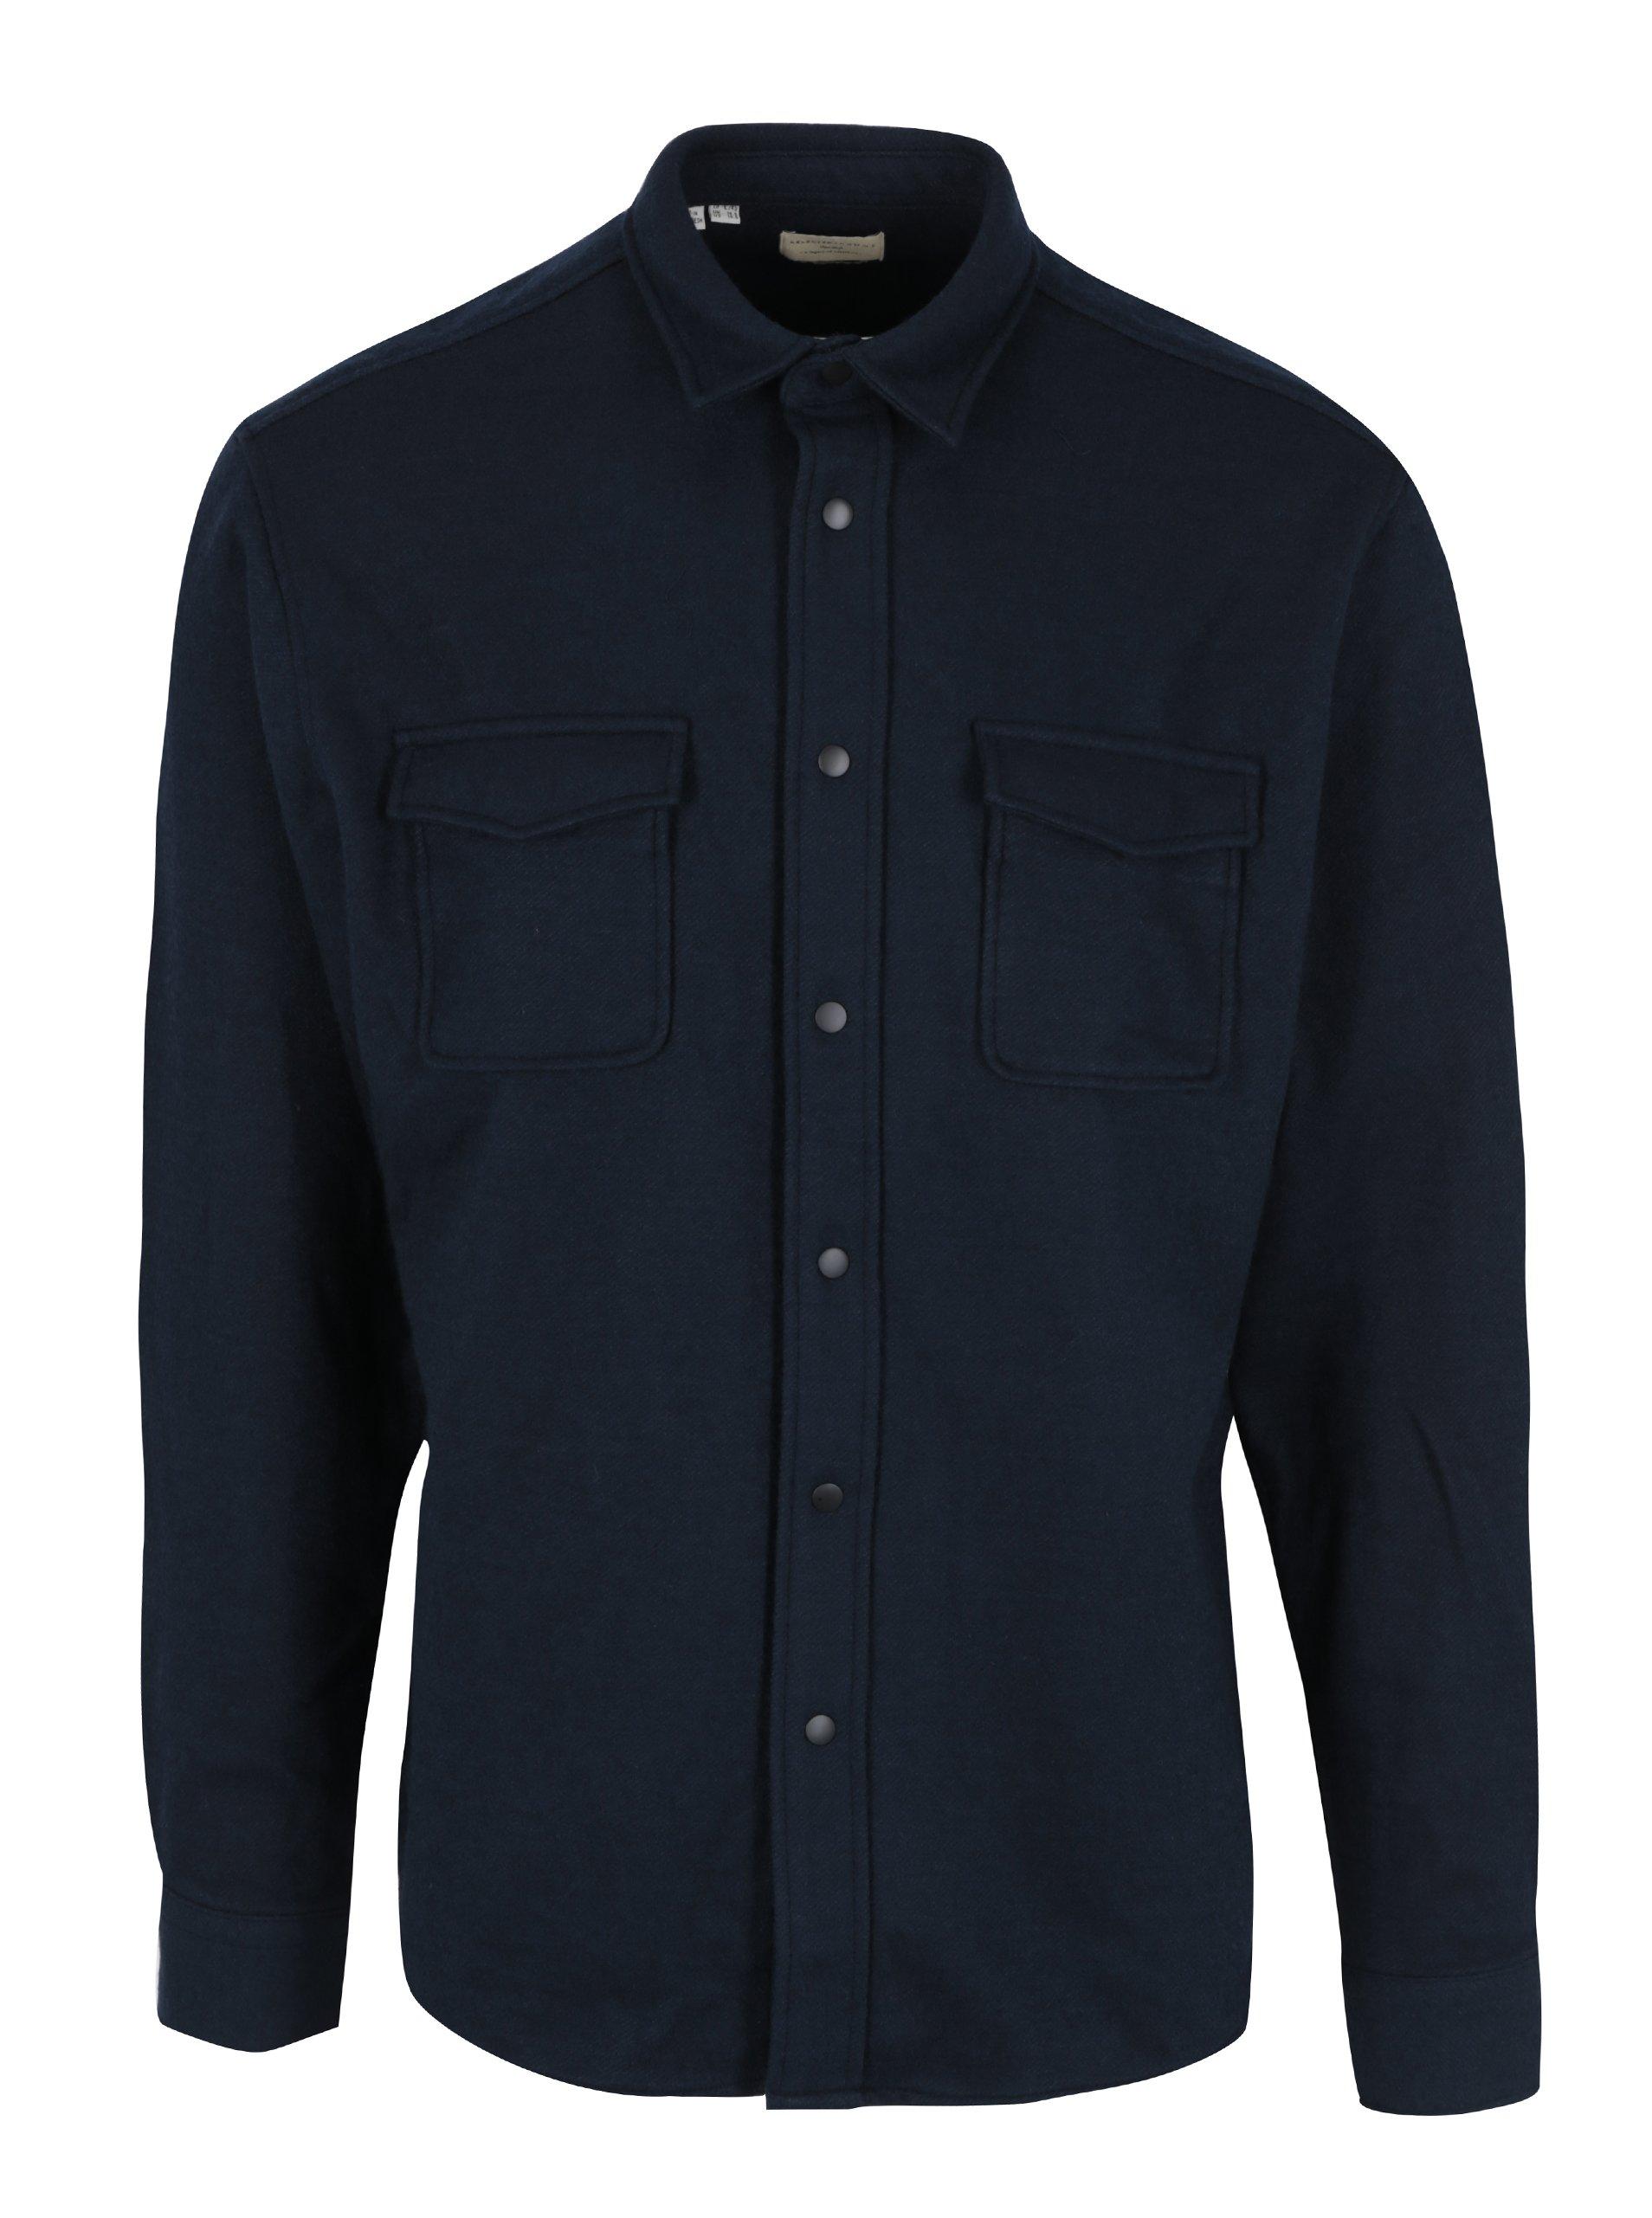 Tmavomodrá regular fit košeľa s prímesou vlny Selected Homme Three Pontus